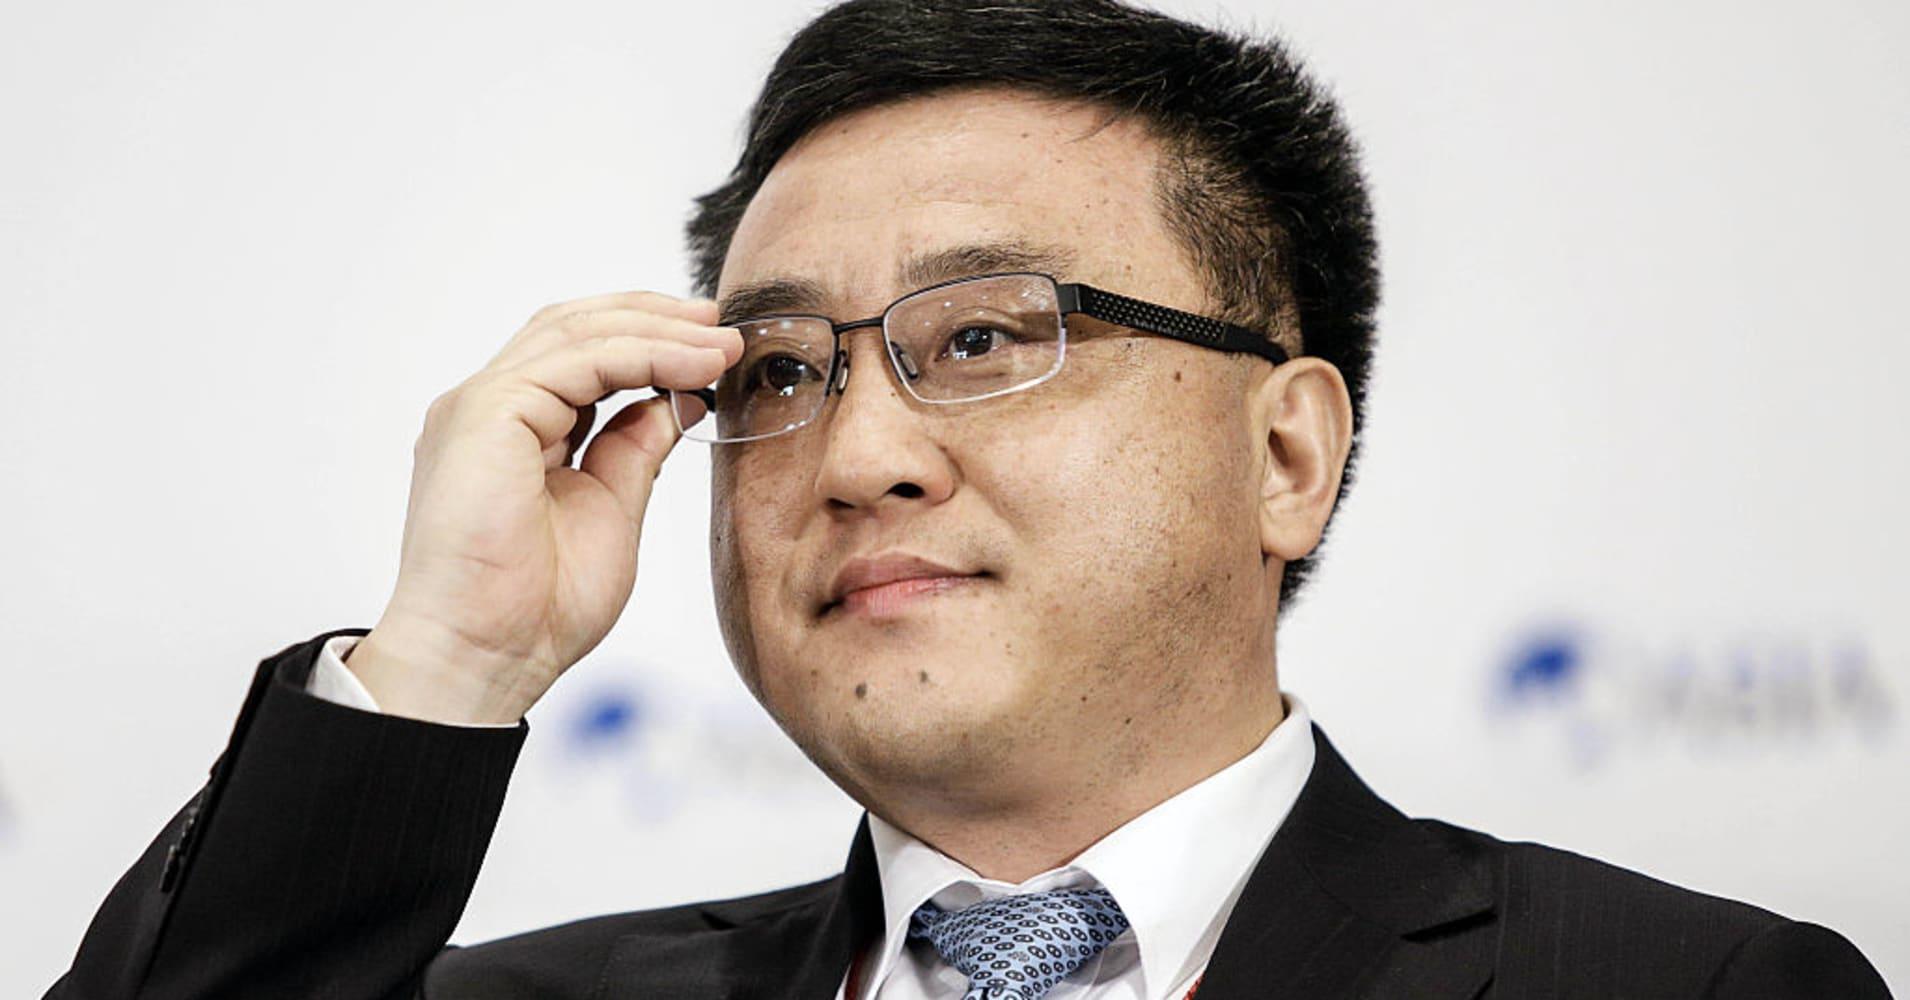 Trump's anti-China sentiment 'detrimental' to world, Baidu president says